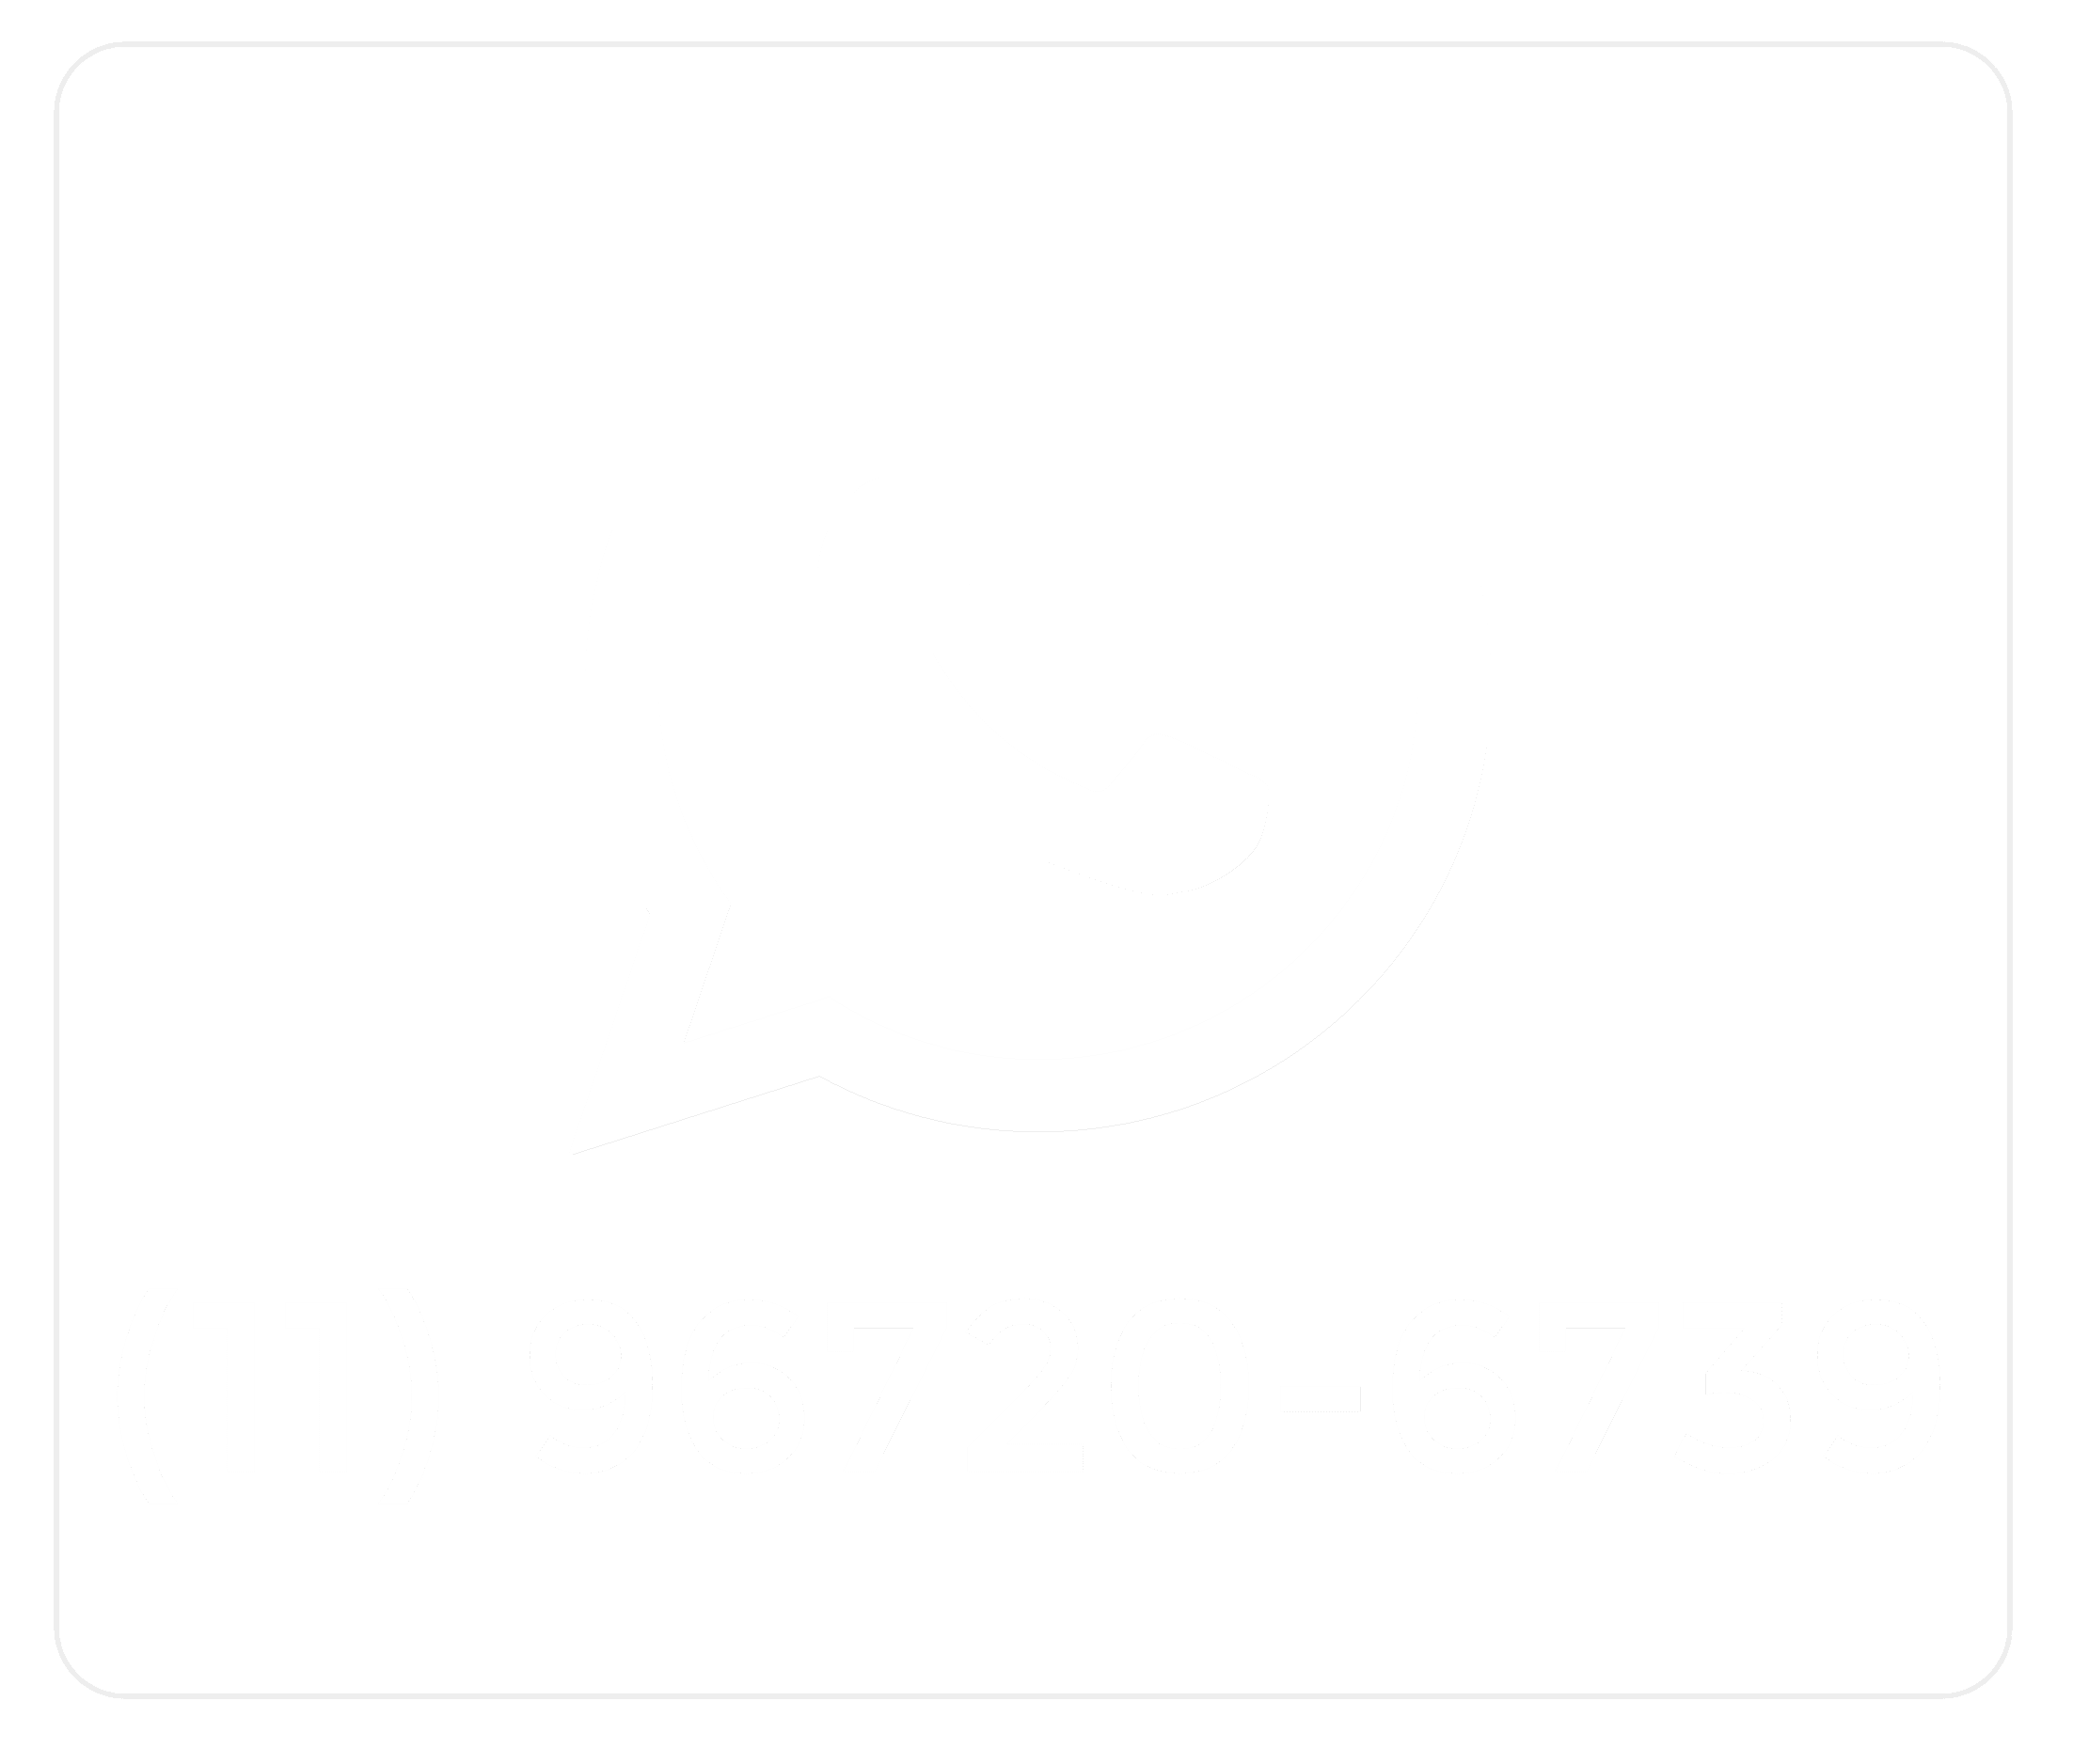 Dedetizadora de Pombos na Vila Morumbi